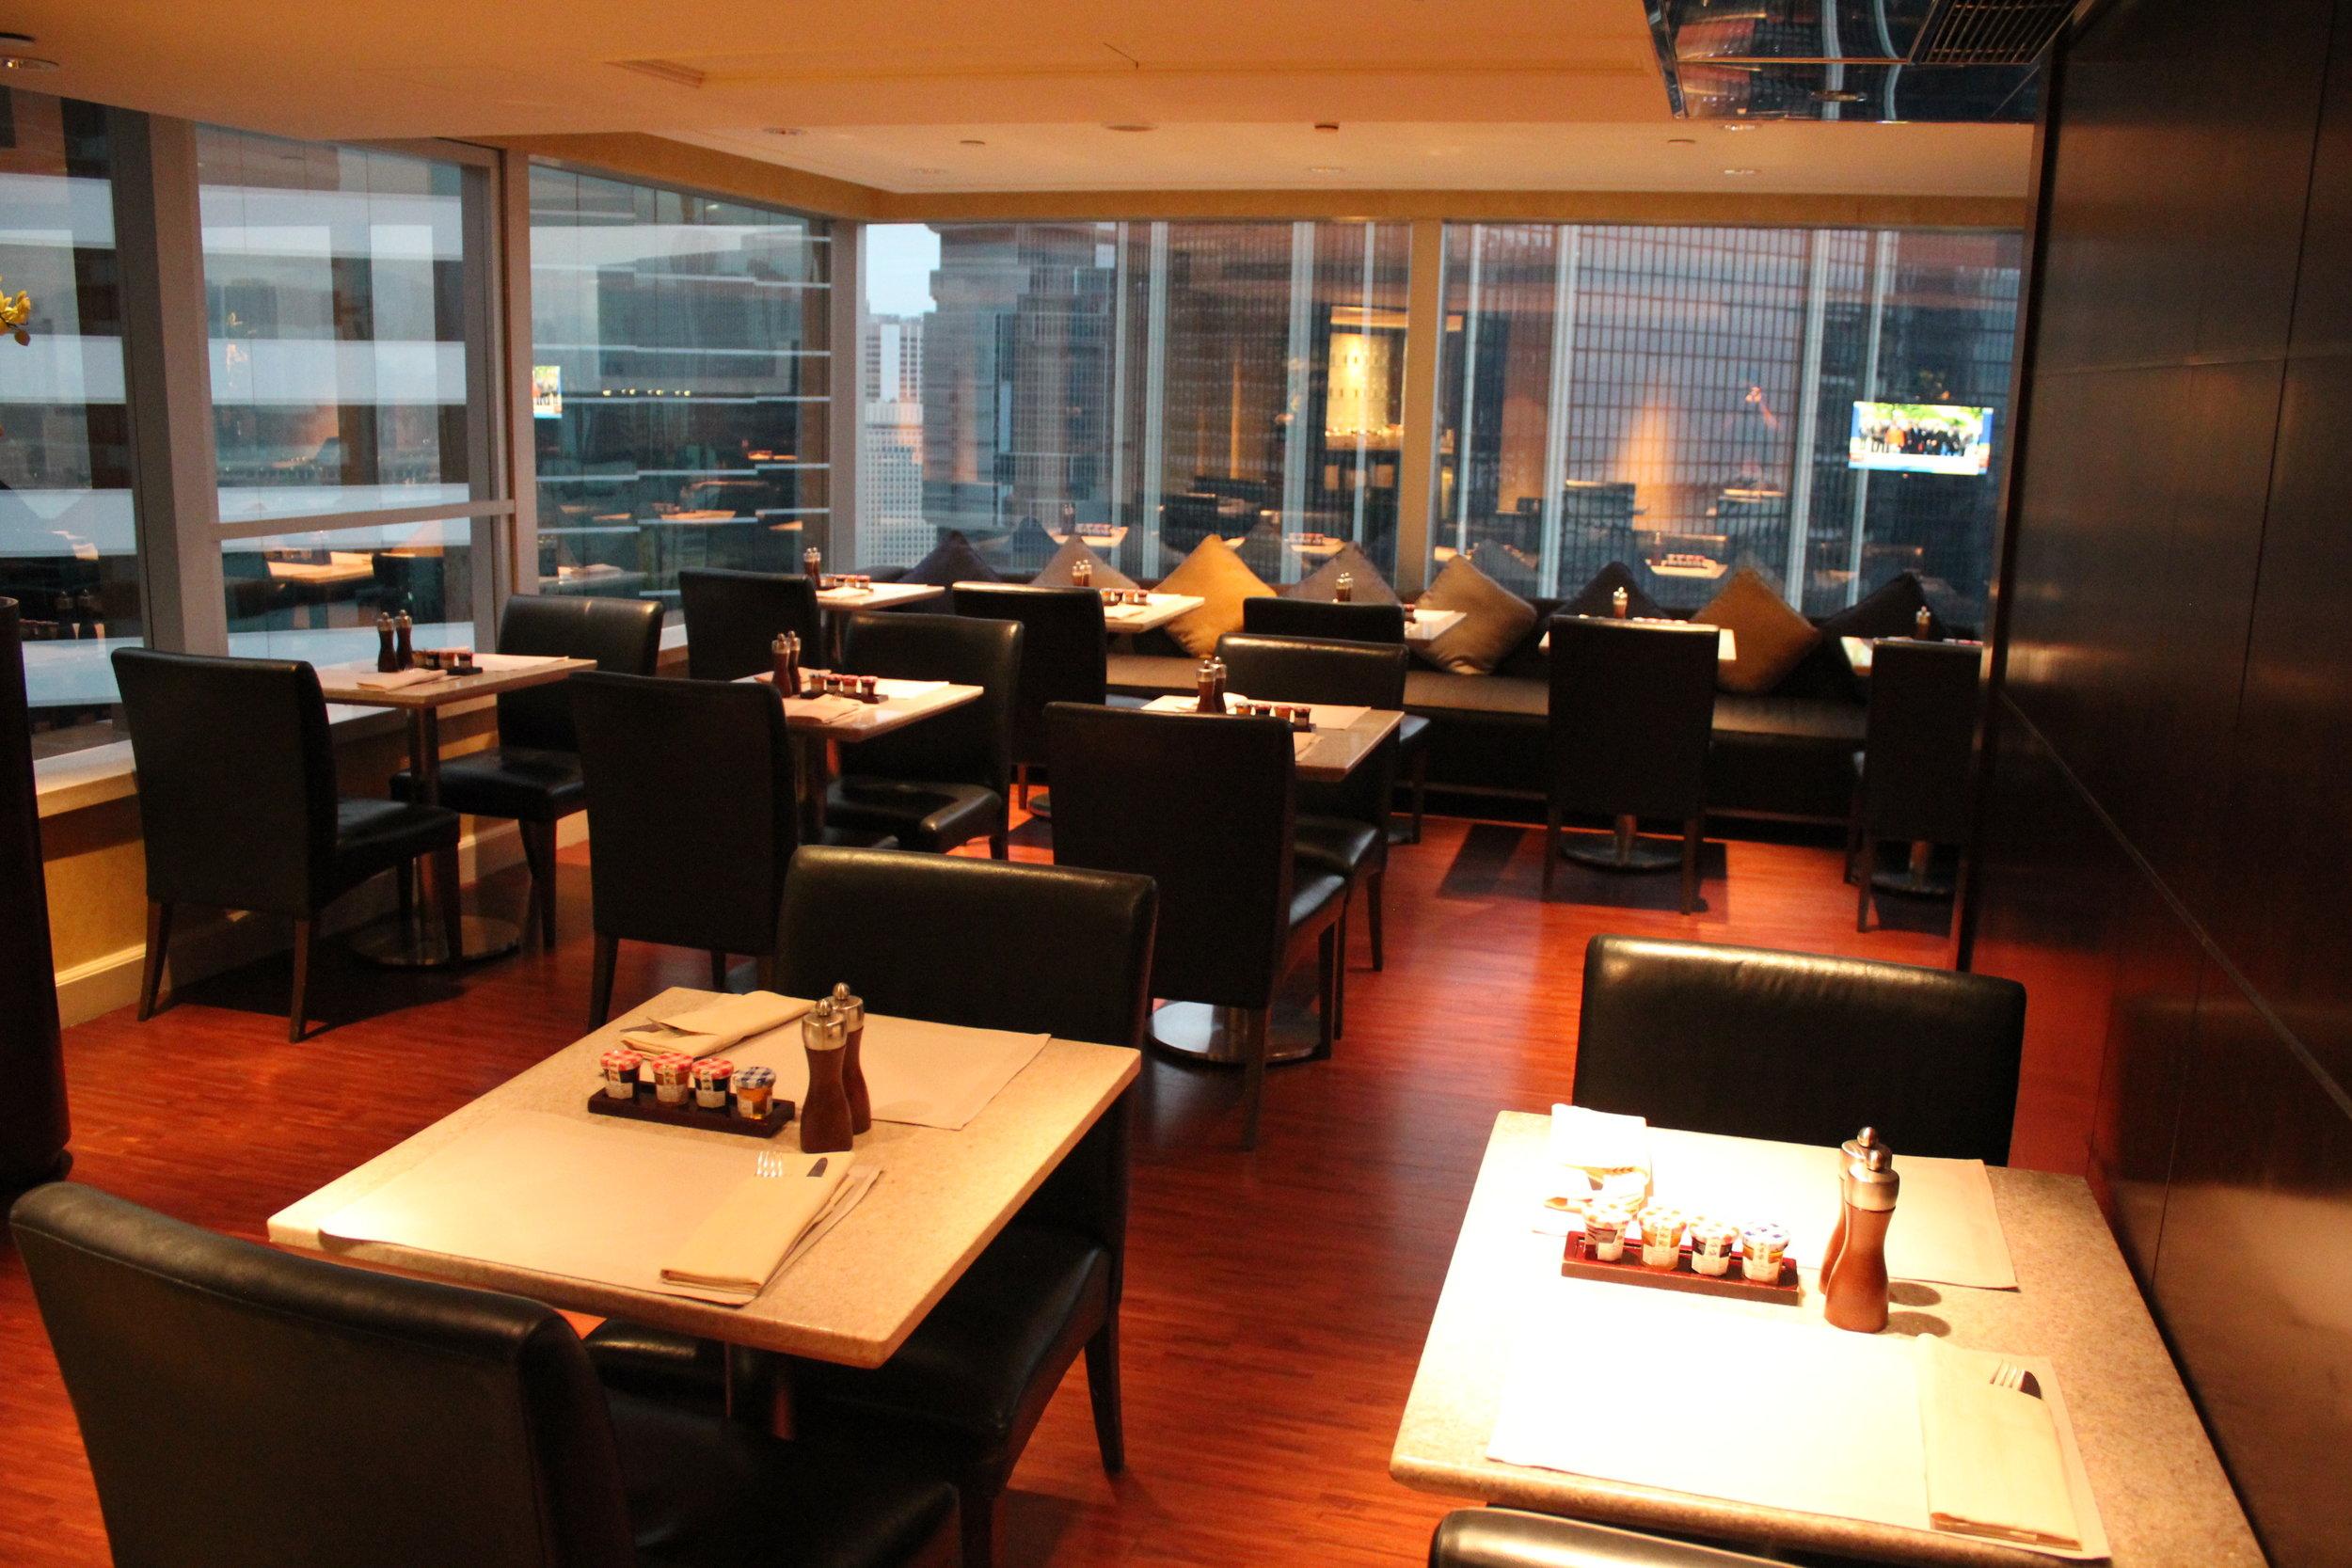 JW Marriott Hong Kong – Executive Lounge lower floor seating